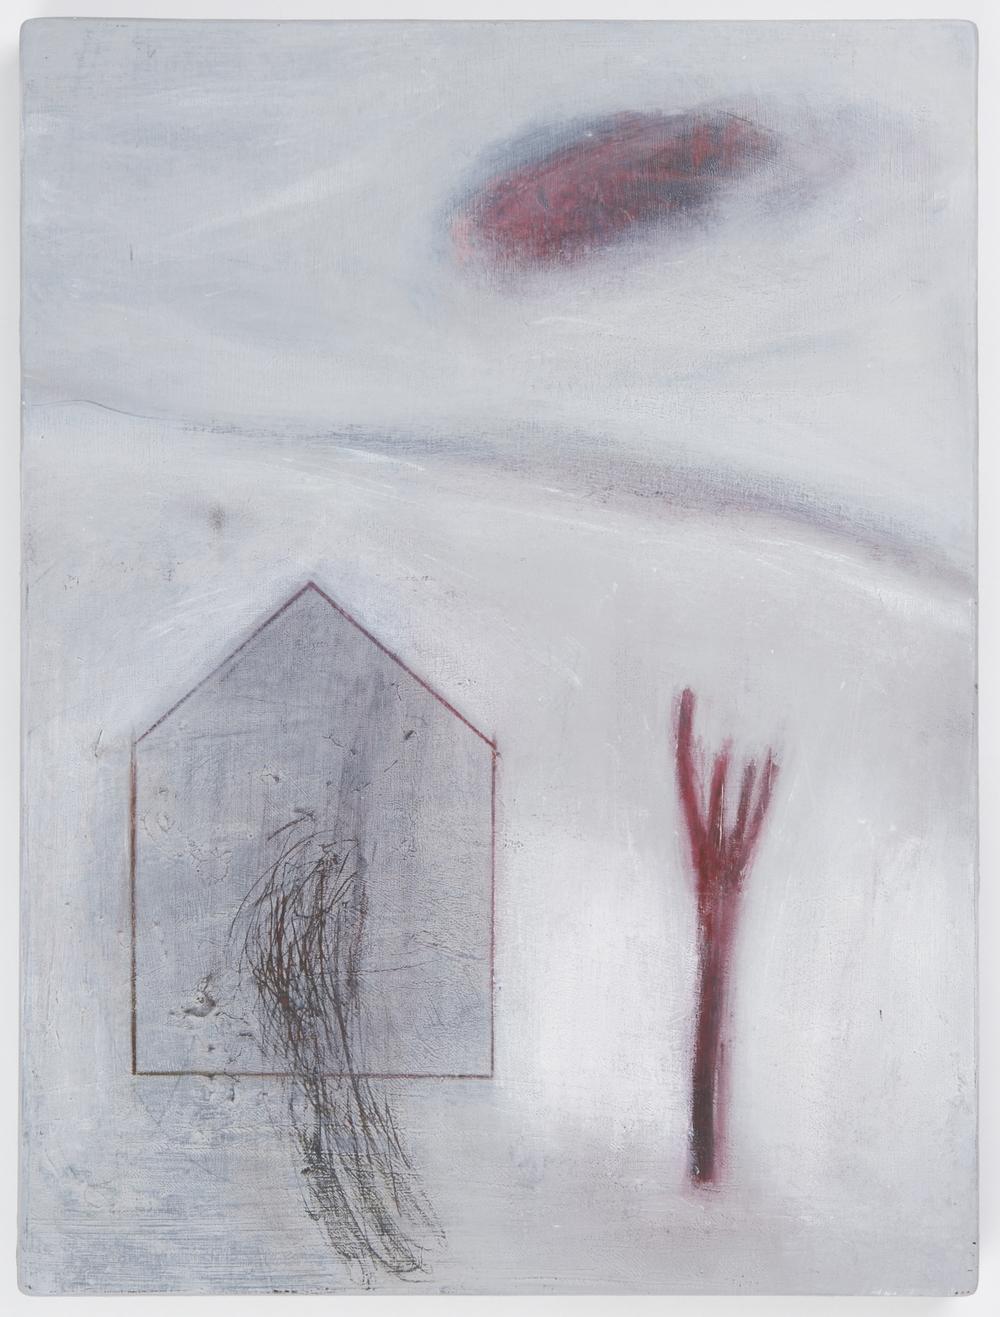 The Cloud, The Tree, The House & The Boy - 063 - 150dpi.jpg